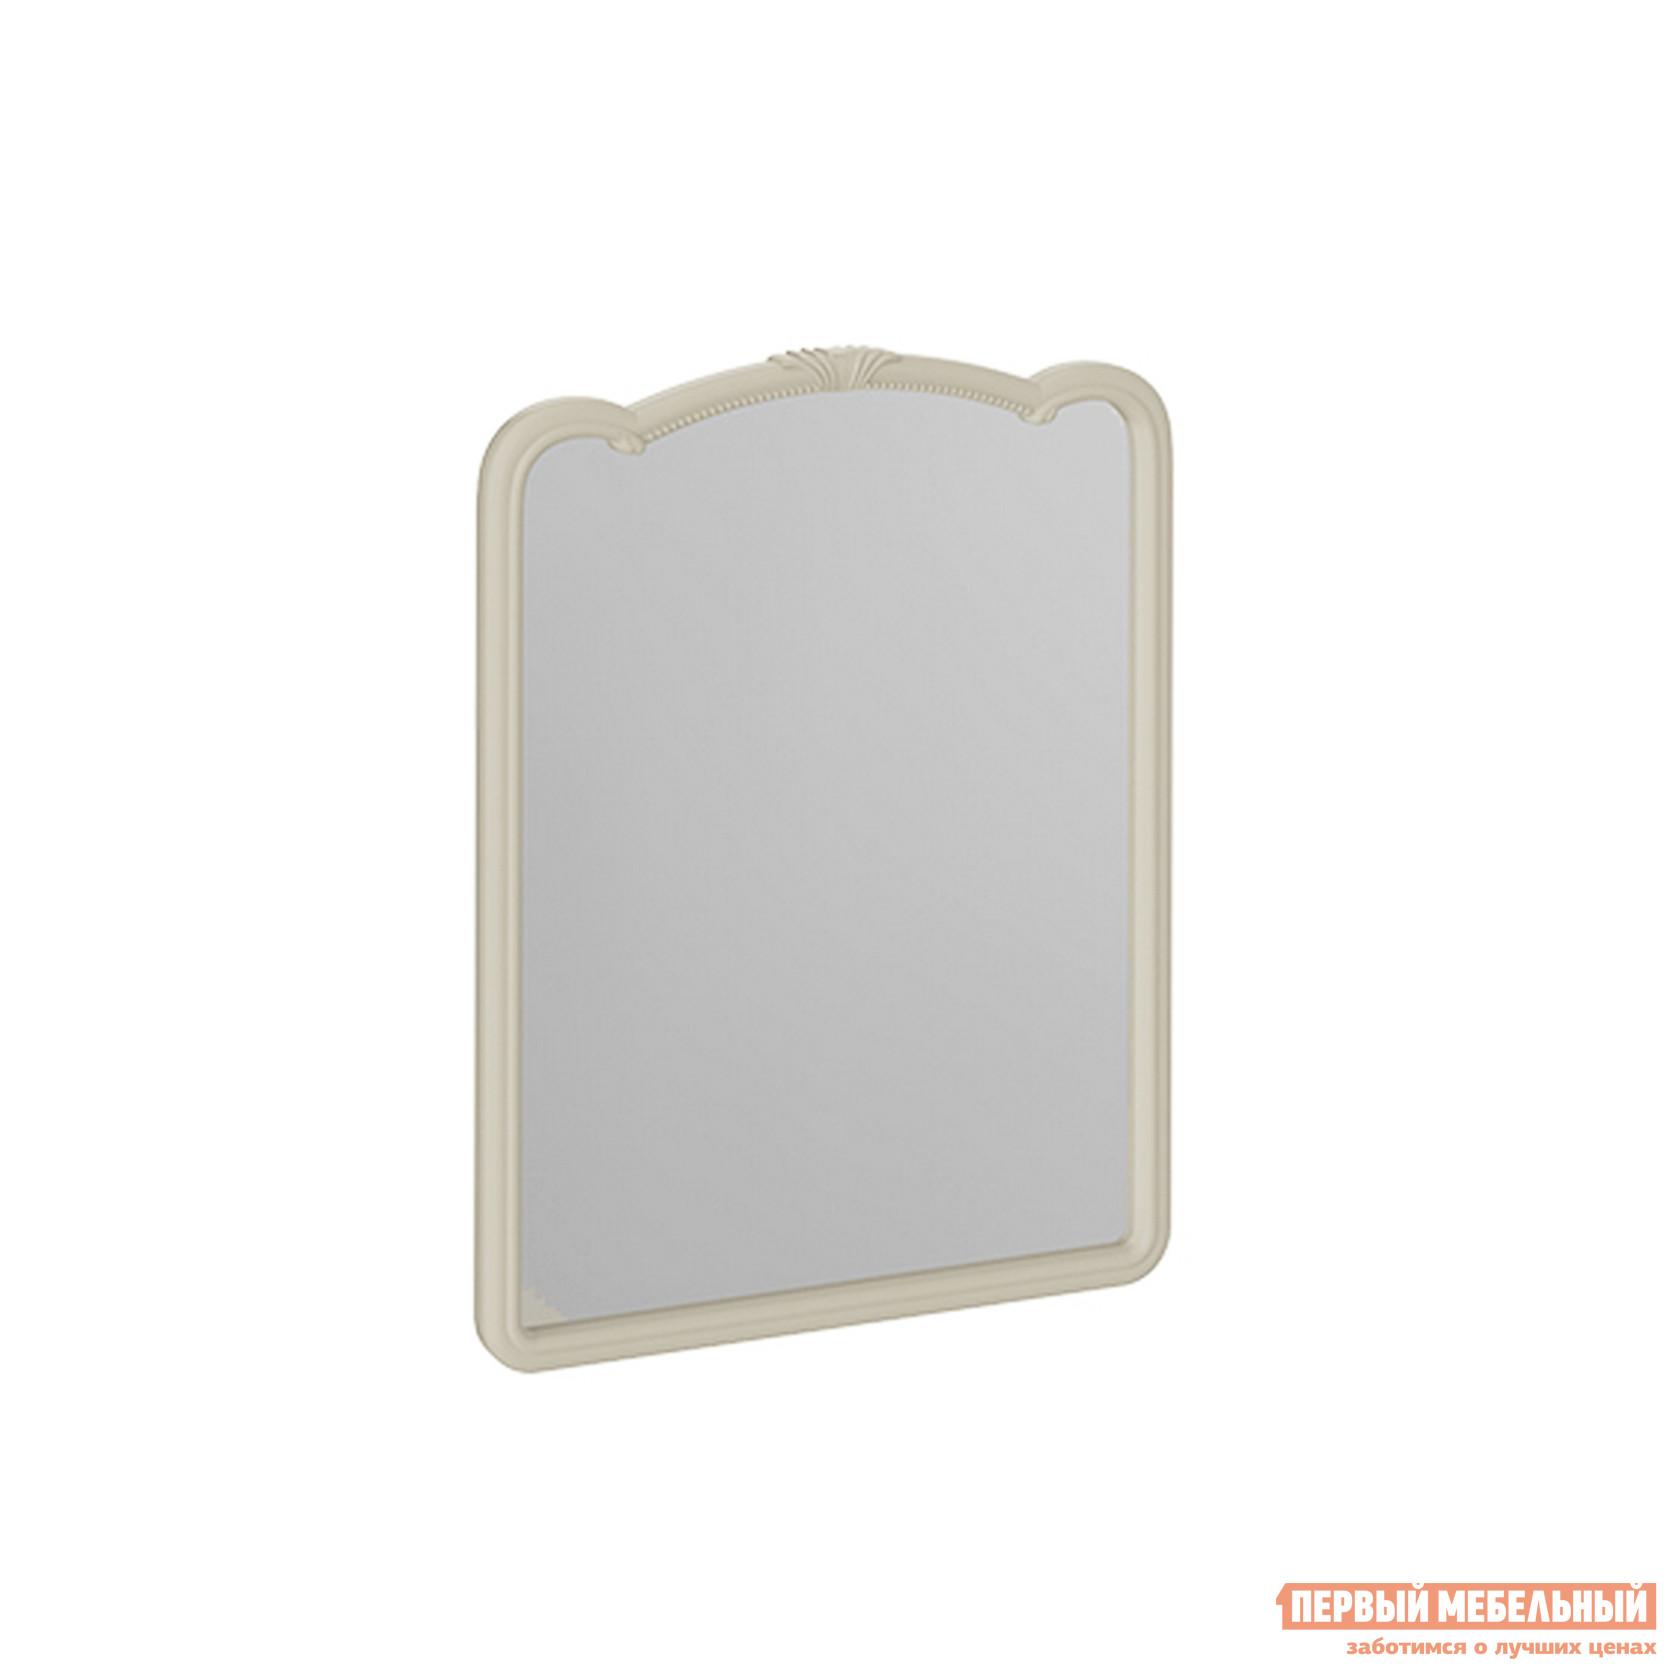 цена на Настенное зеркало ТриЯ Панель с зеркалом Лорена ТД-254.06.01